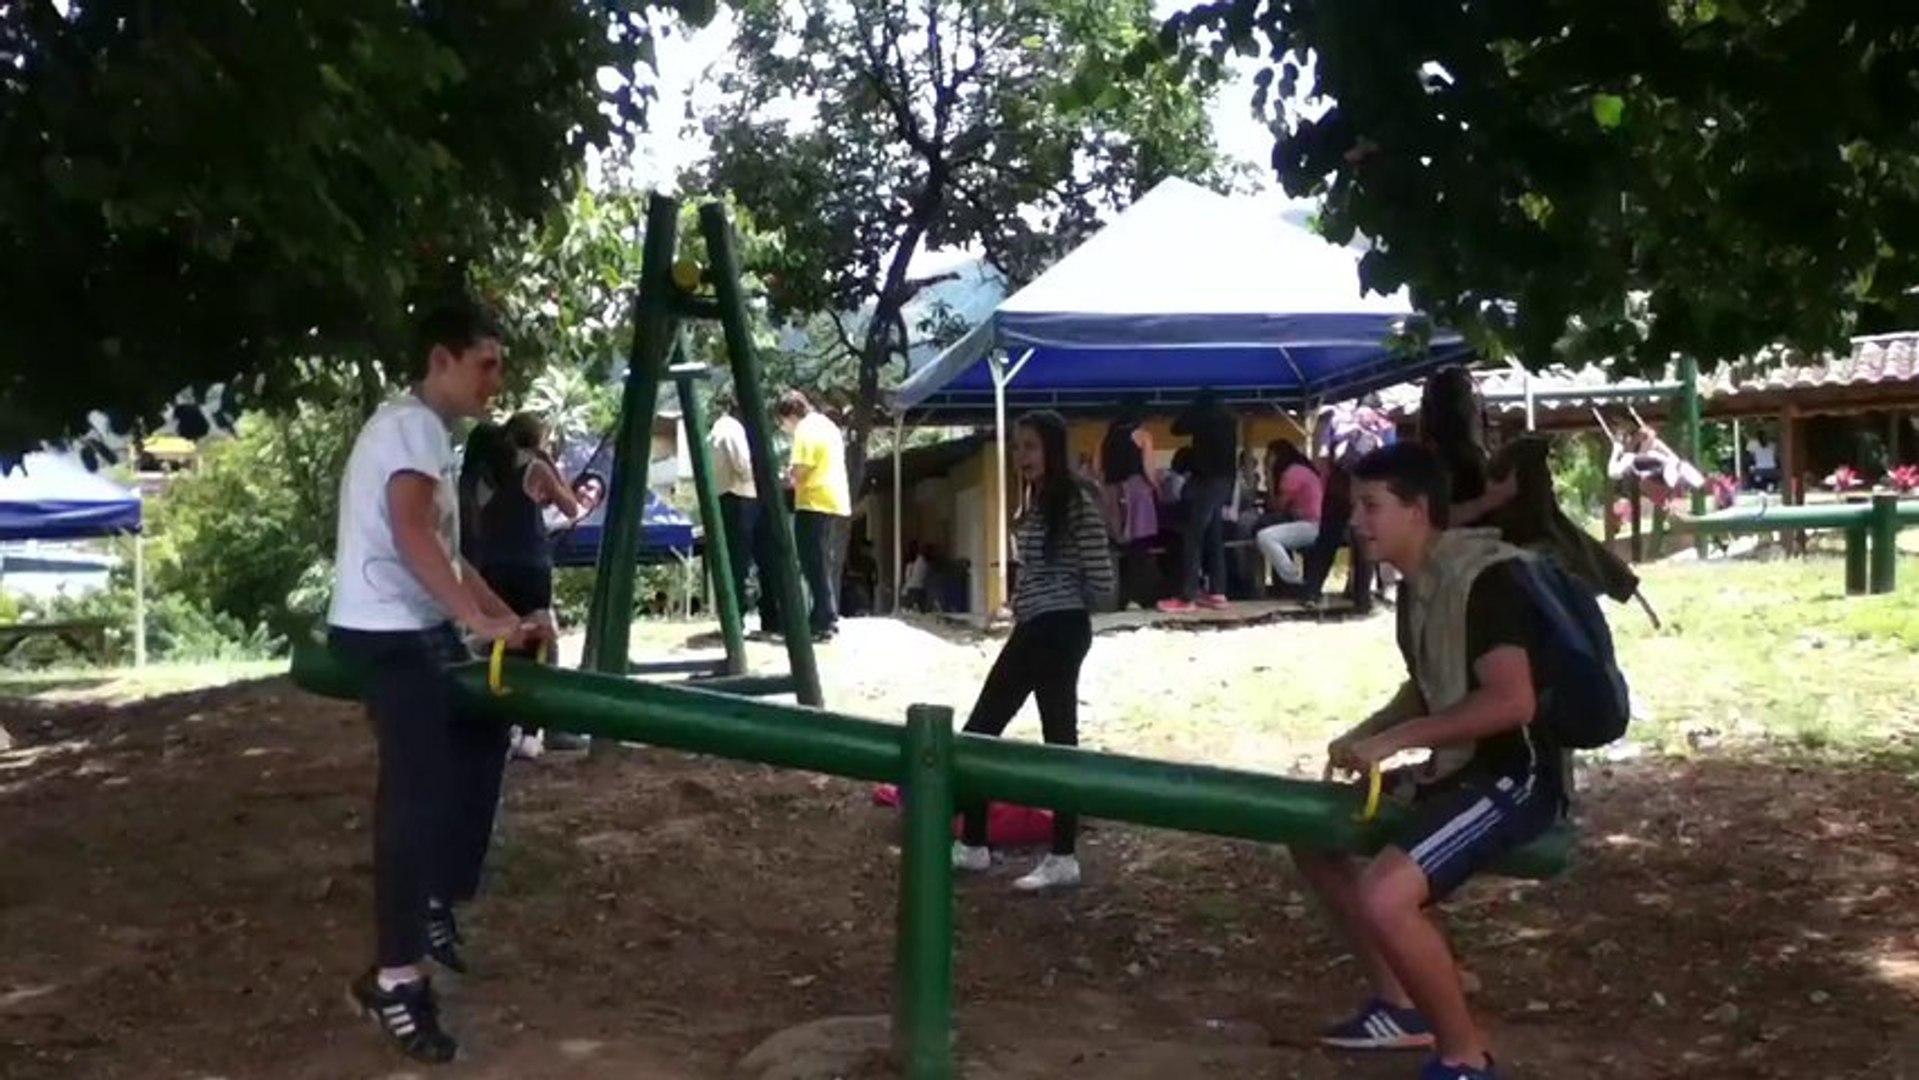 Kids playing at school fail